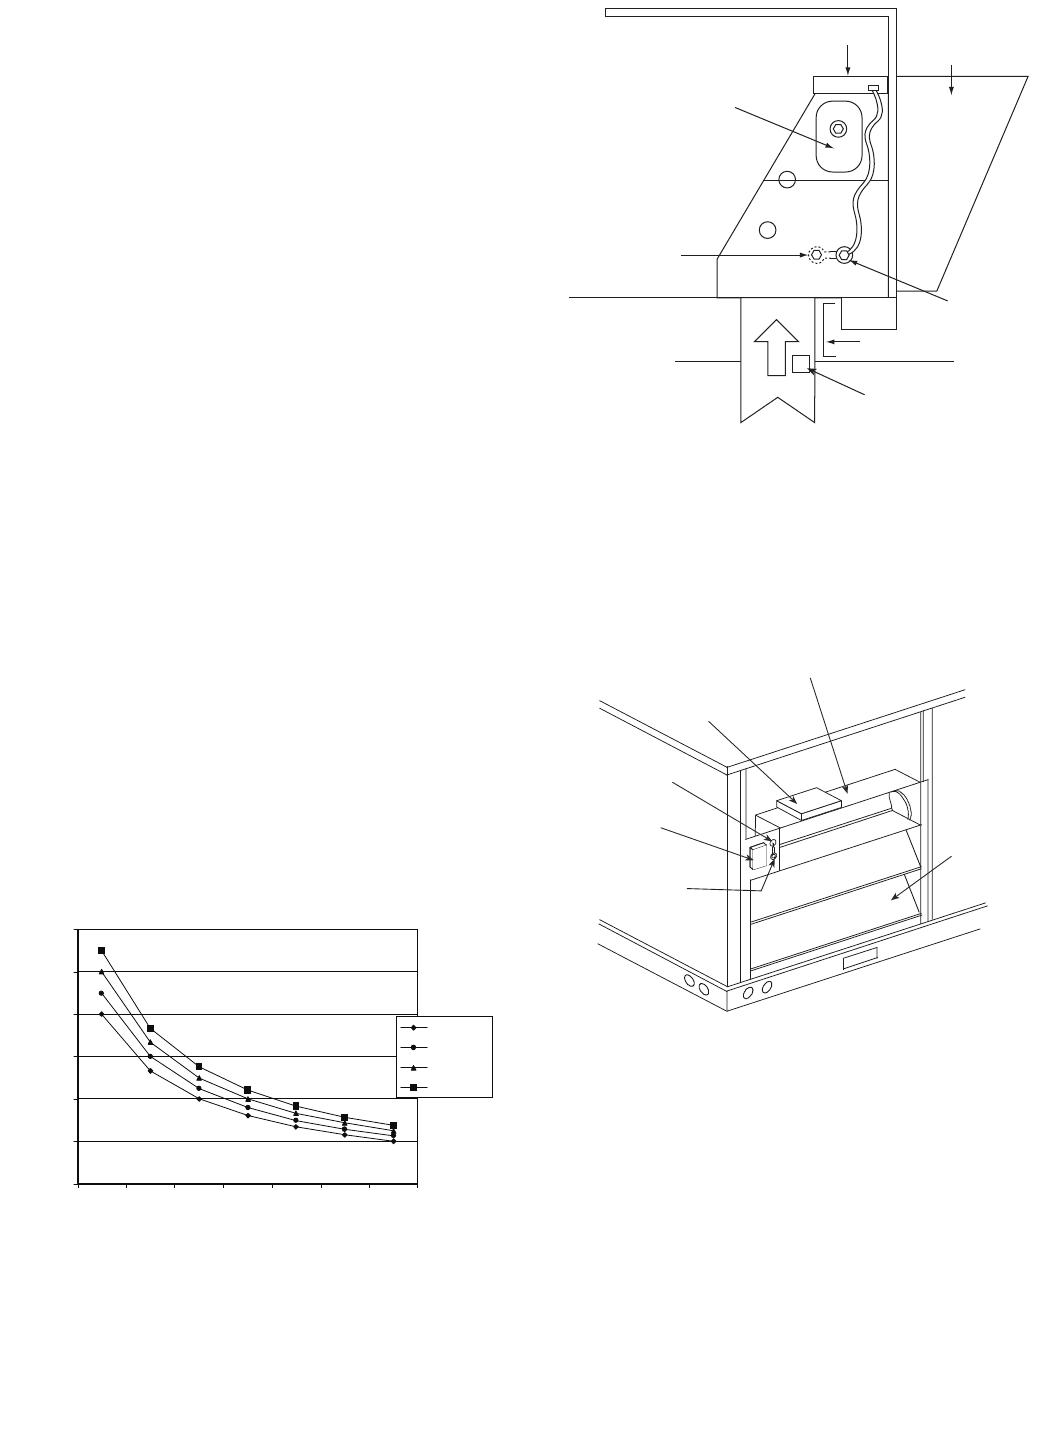 humidistat wiring diagram wiring diagram database Heat Pump Wiring Diagram wiring diagram imit thermostat wiring diagram database aprilaire 110 wiring diagram installation bryant durapac series 580f